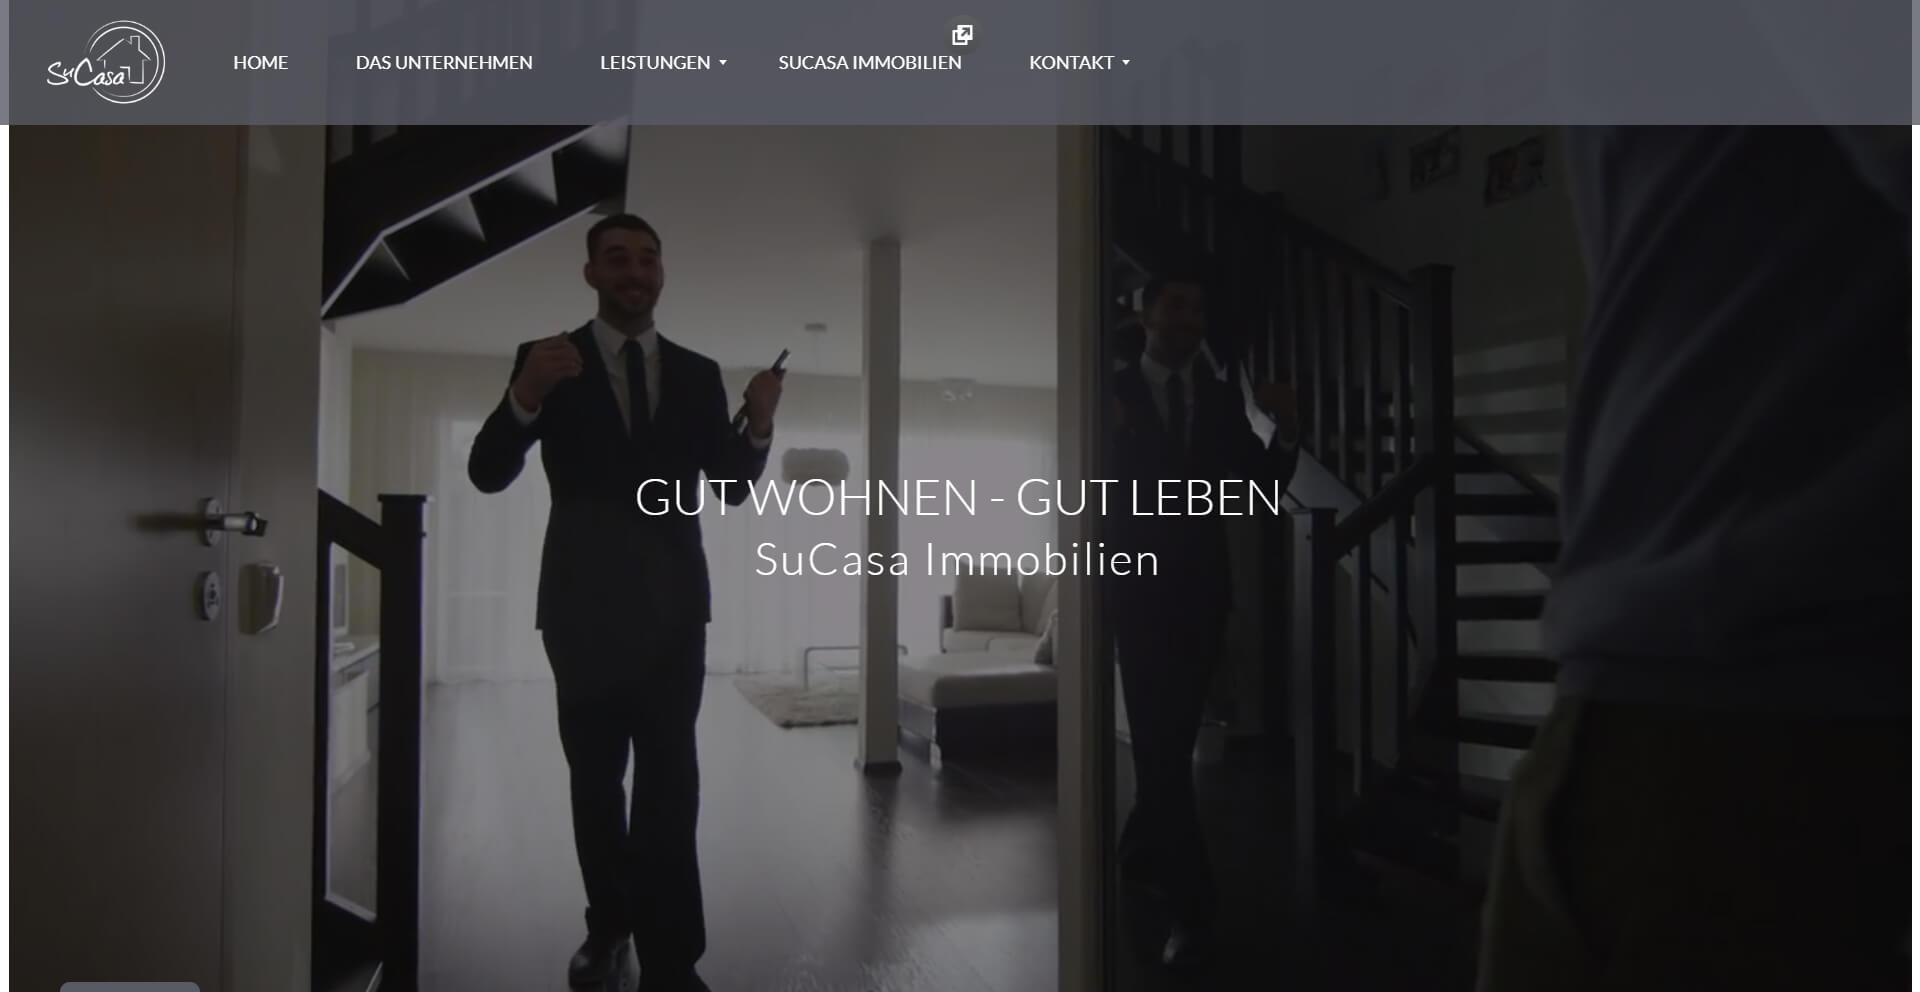 SuCasa Immobilien GmbH